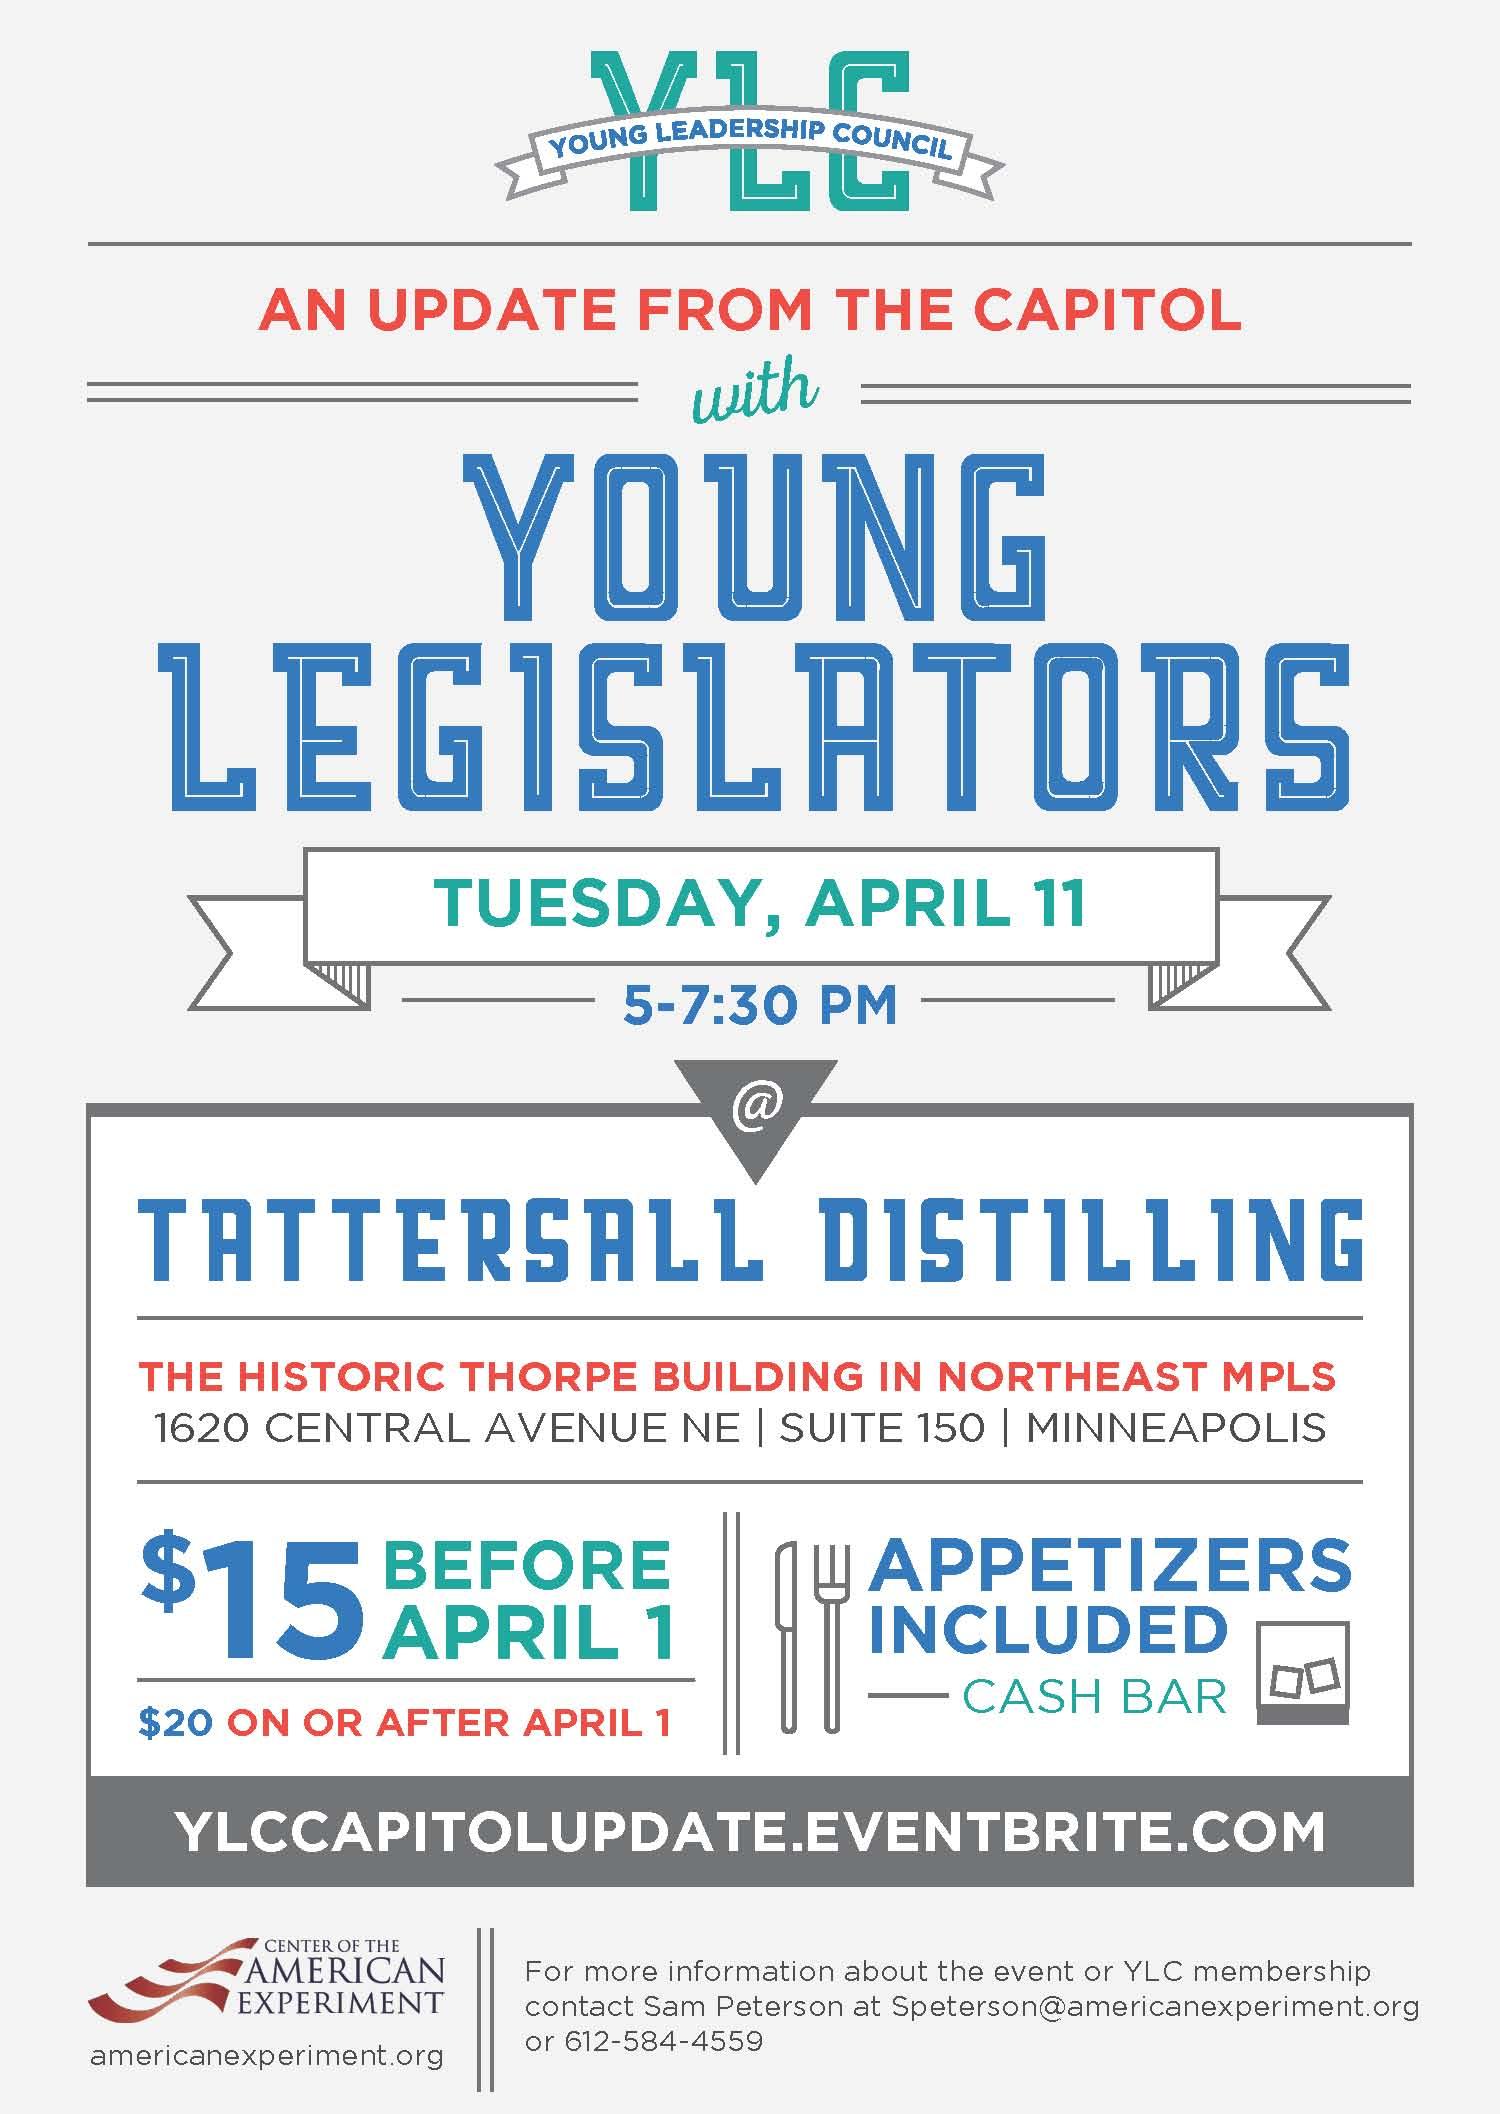 YLC_YoungLegislatorsCapitolUpdate_EarlyBird_Invite_PR